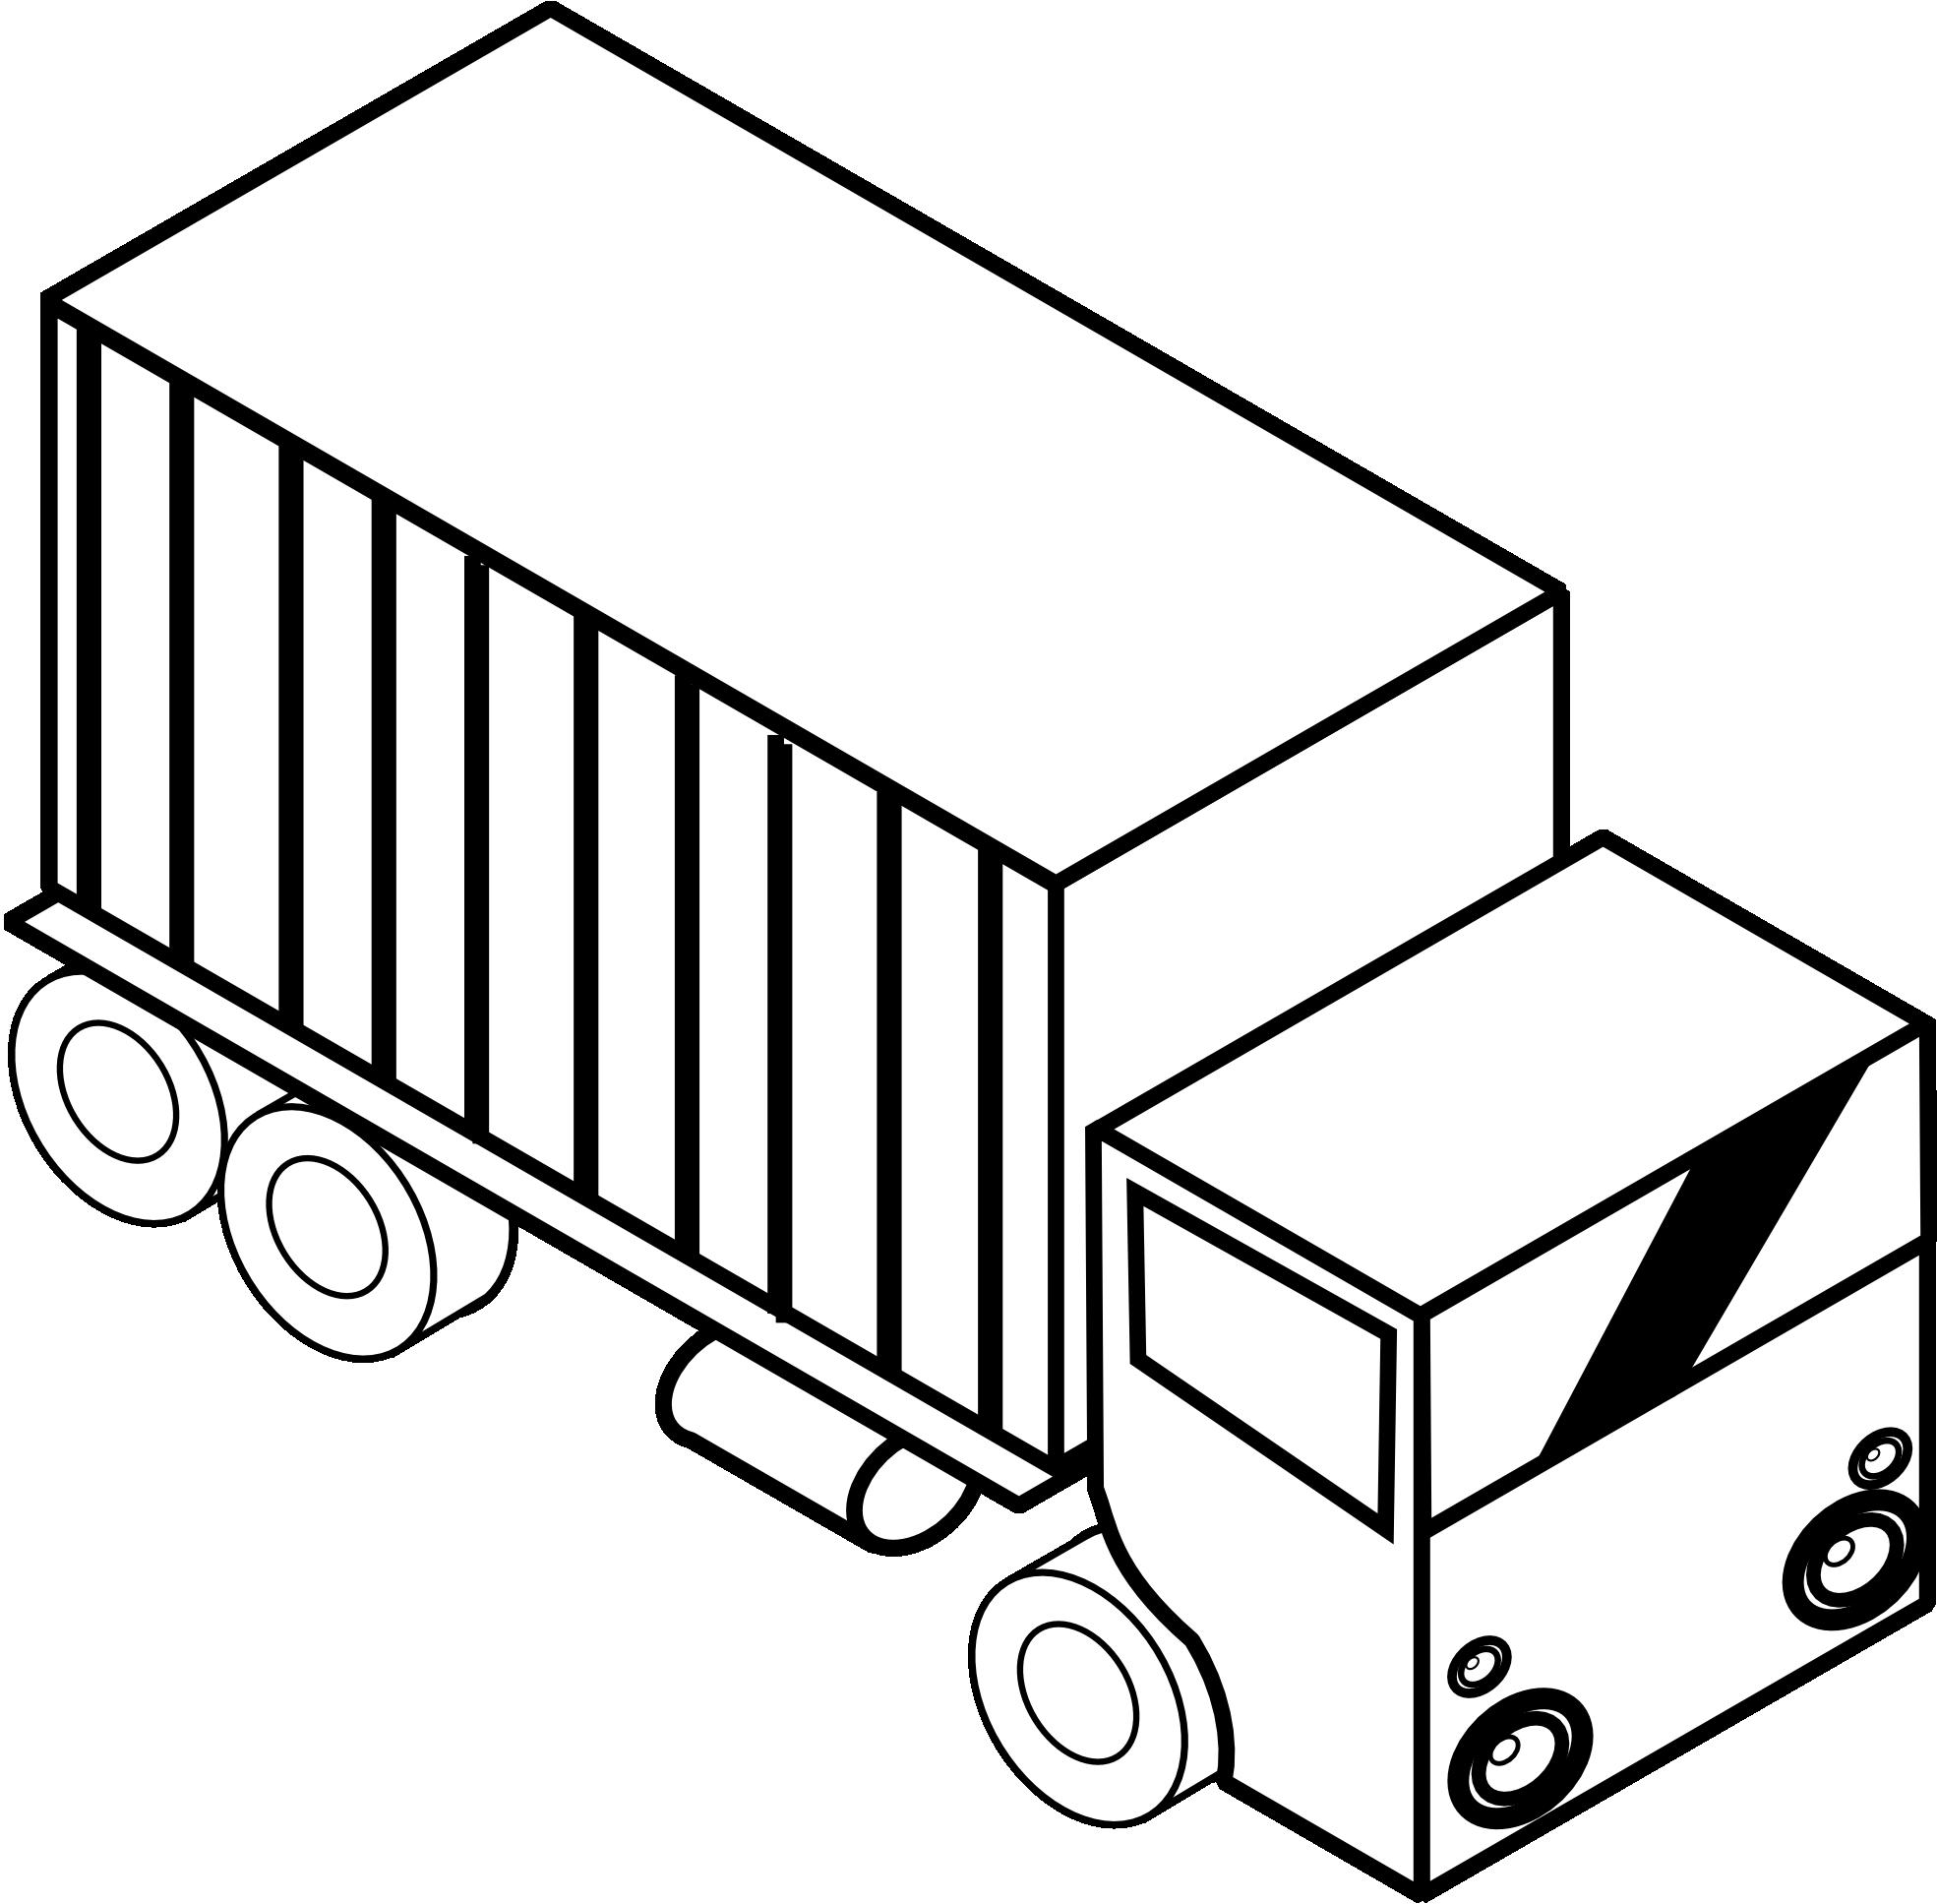 Truck clipart transport truck Black transport truck white free